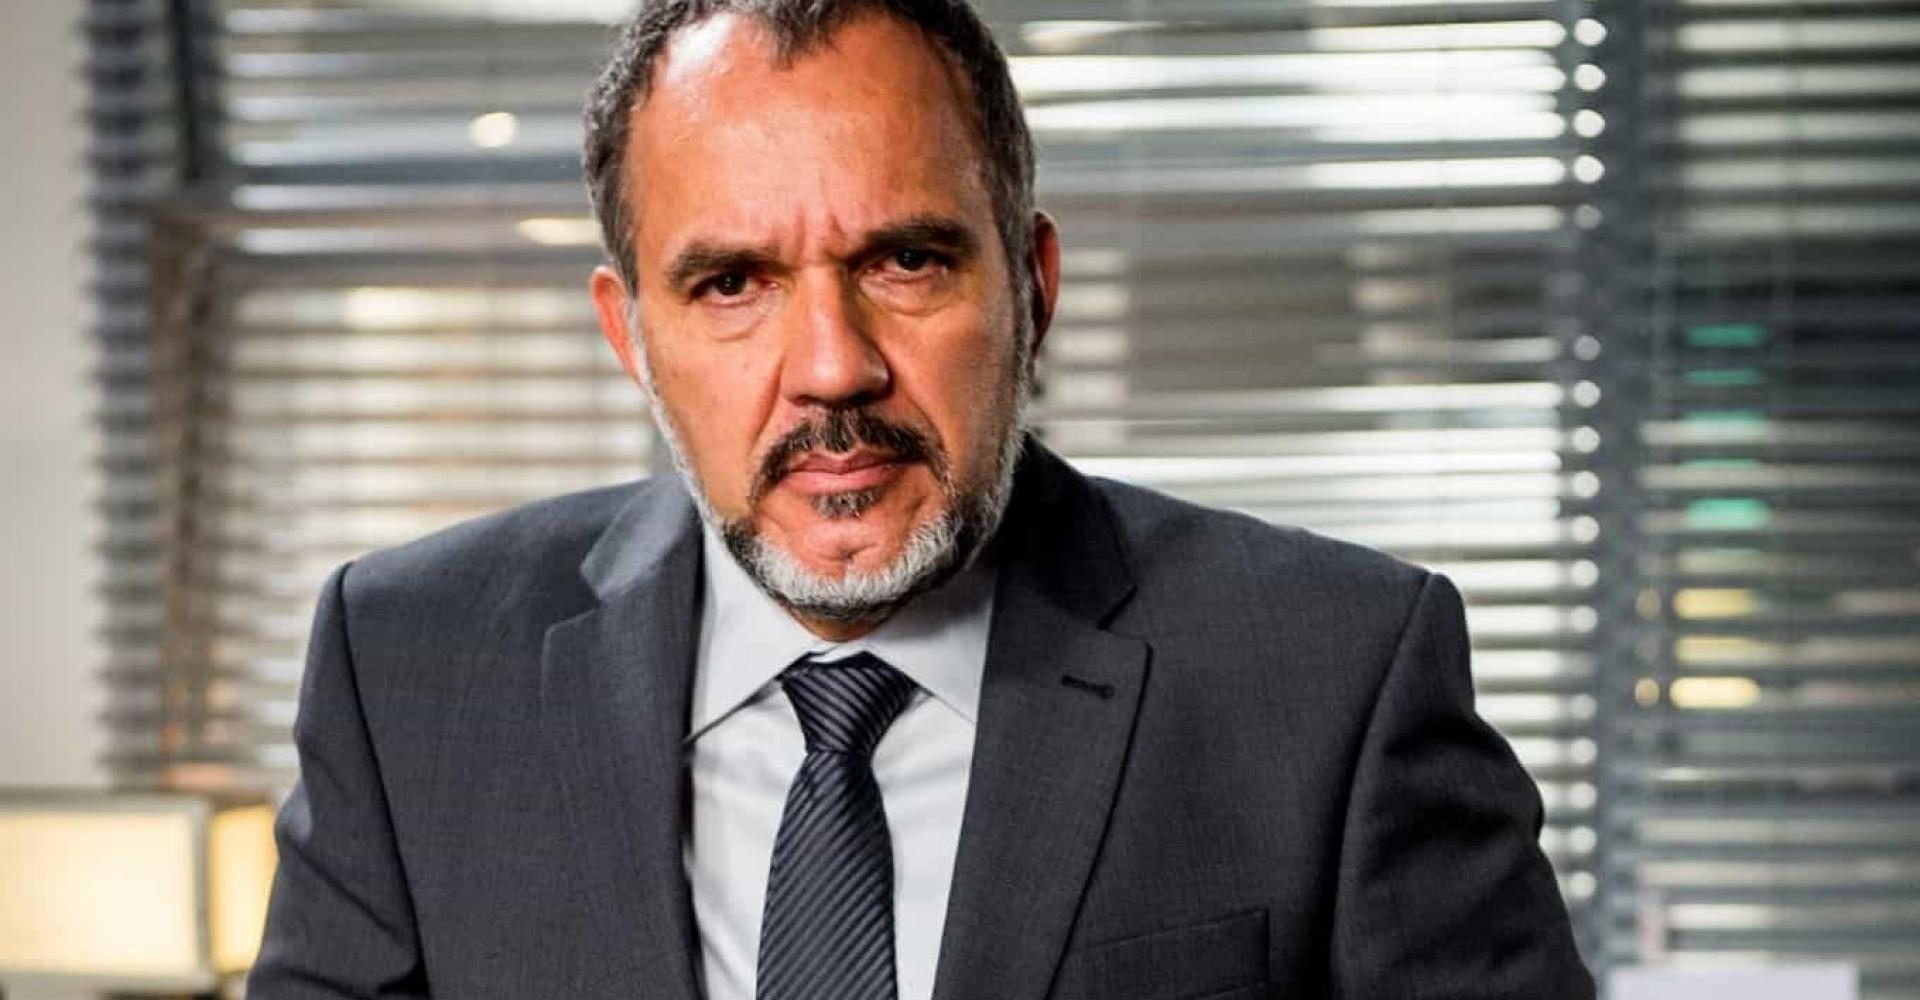 Futuro de Humberto Martins na Globo é incerto após polêmica sobre política